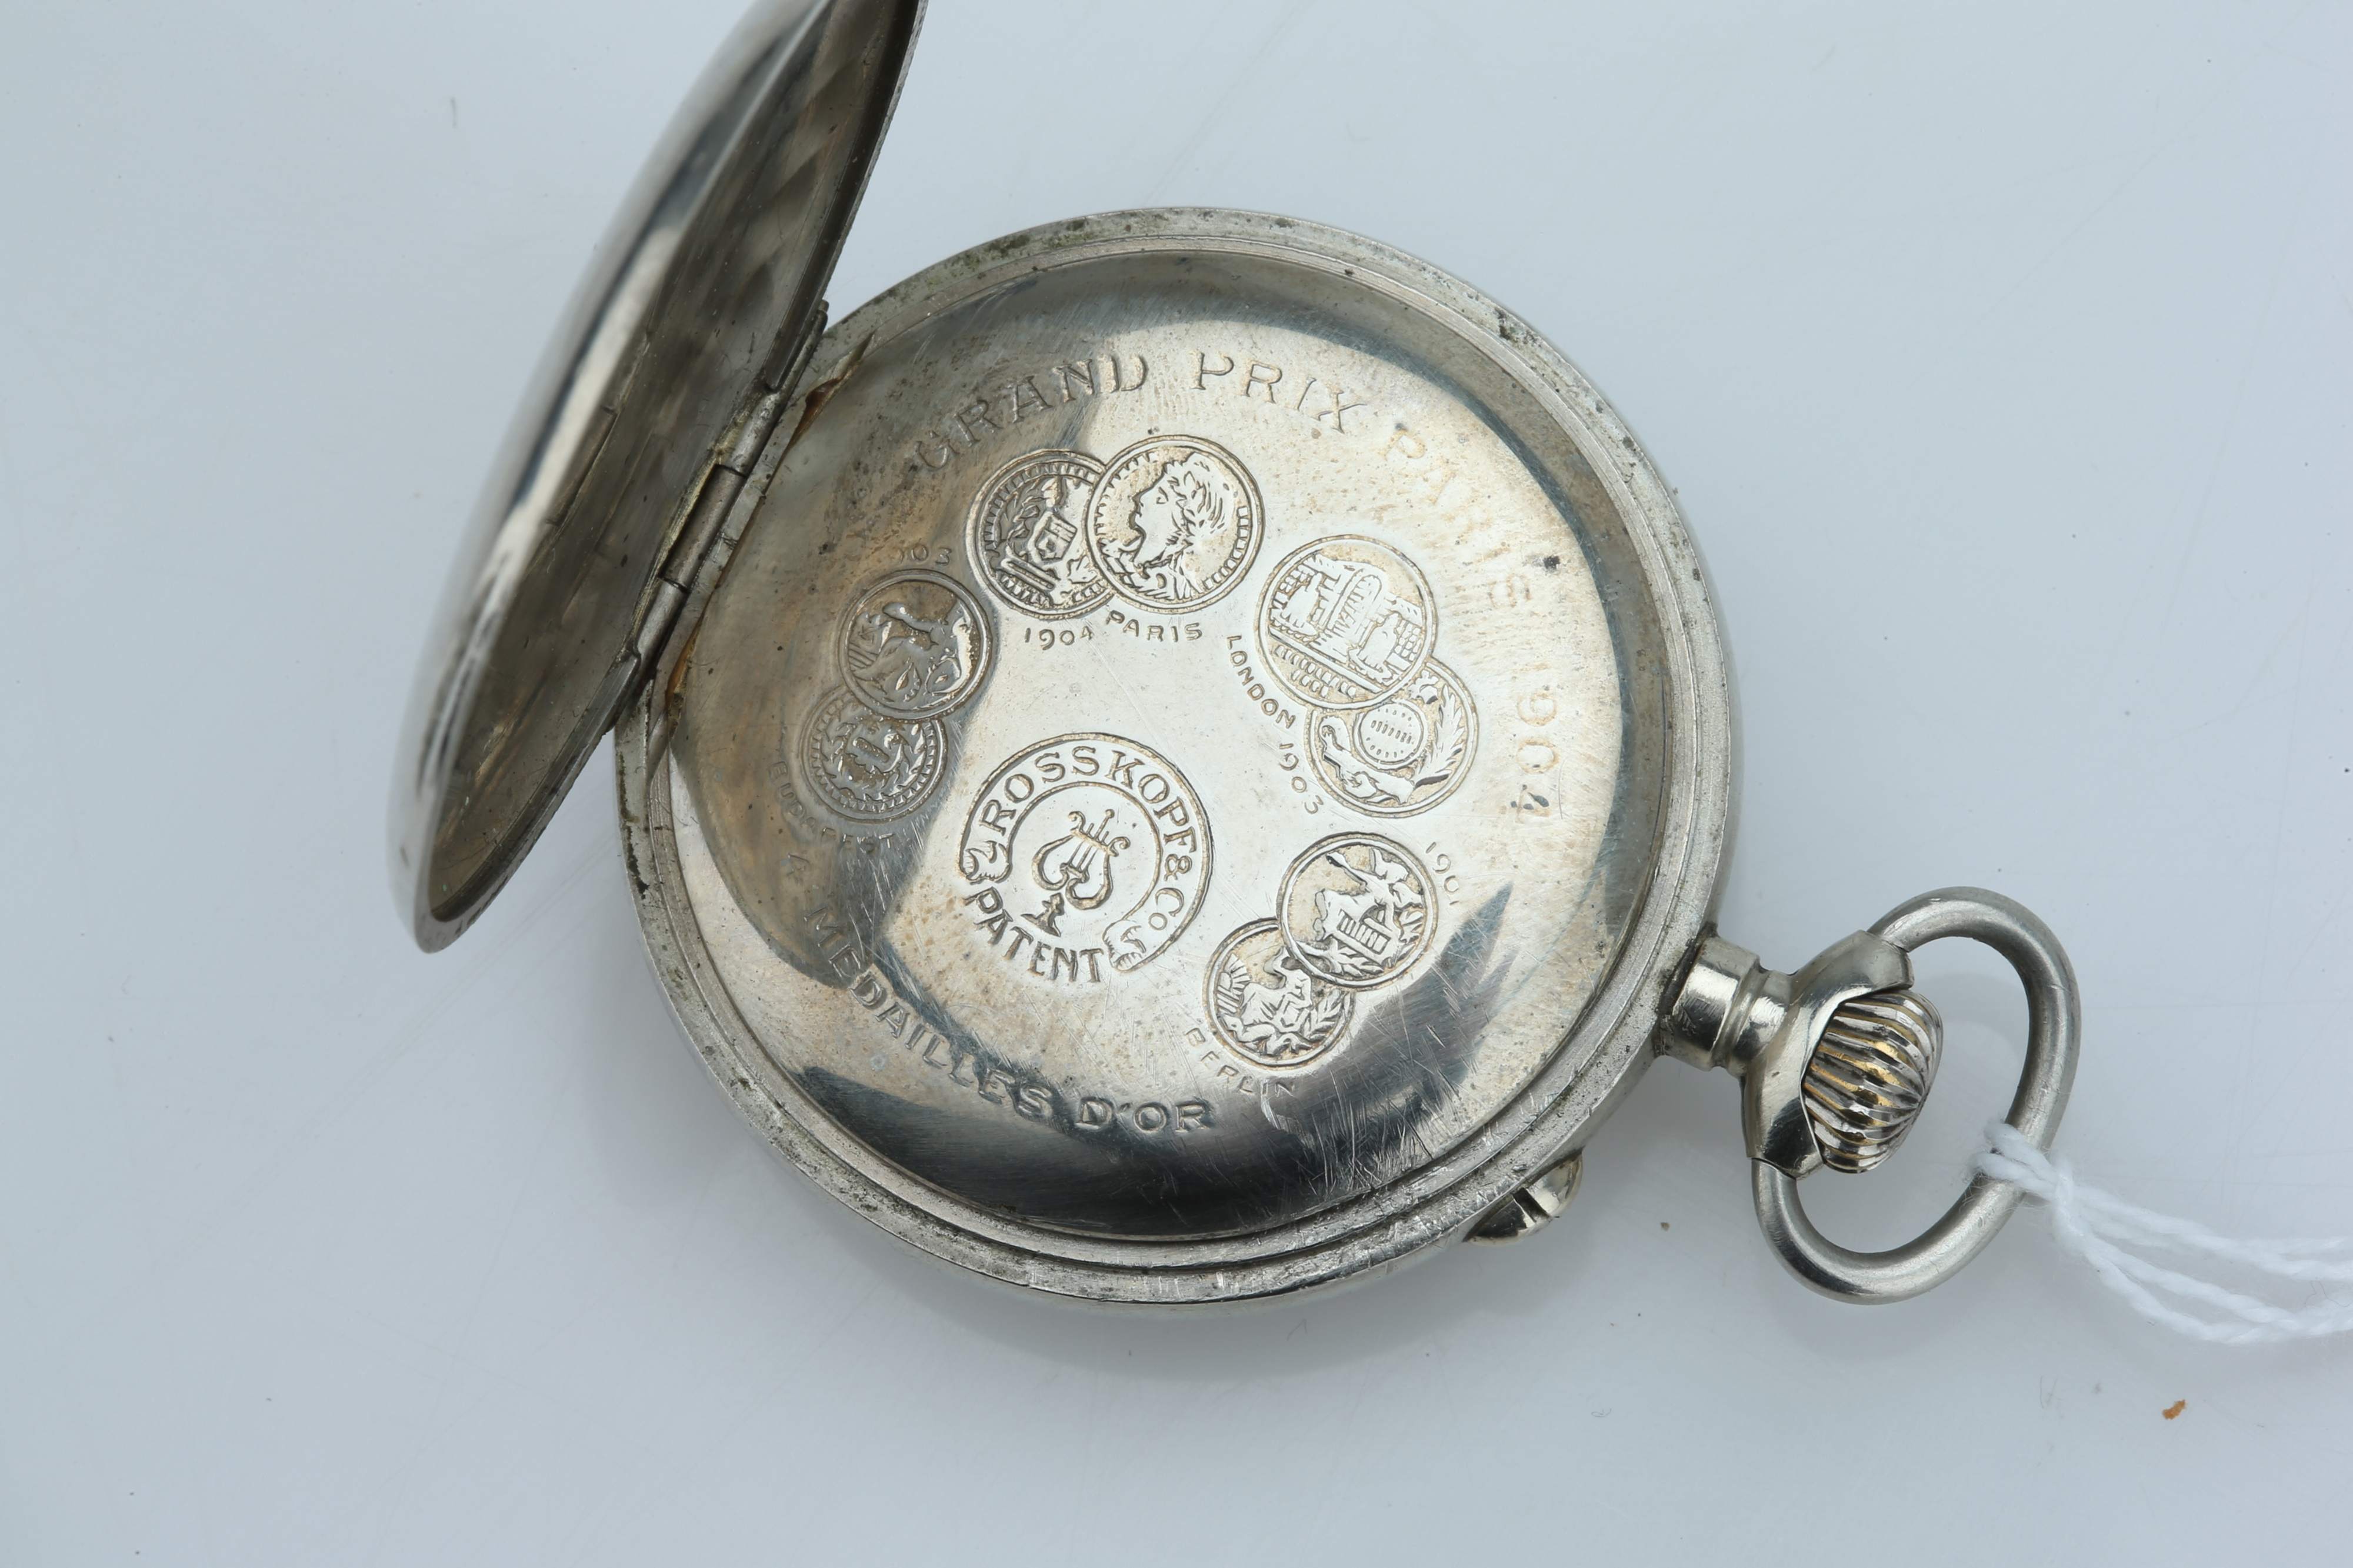 A Swiss Pocket Watch, - Image 2 of 4